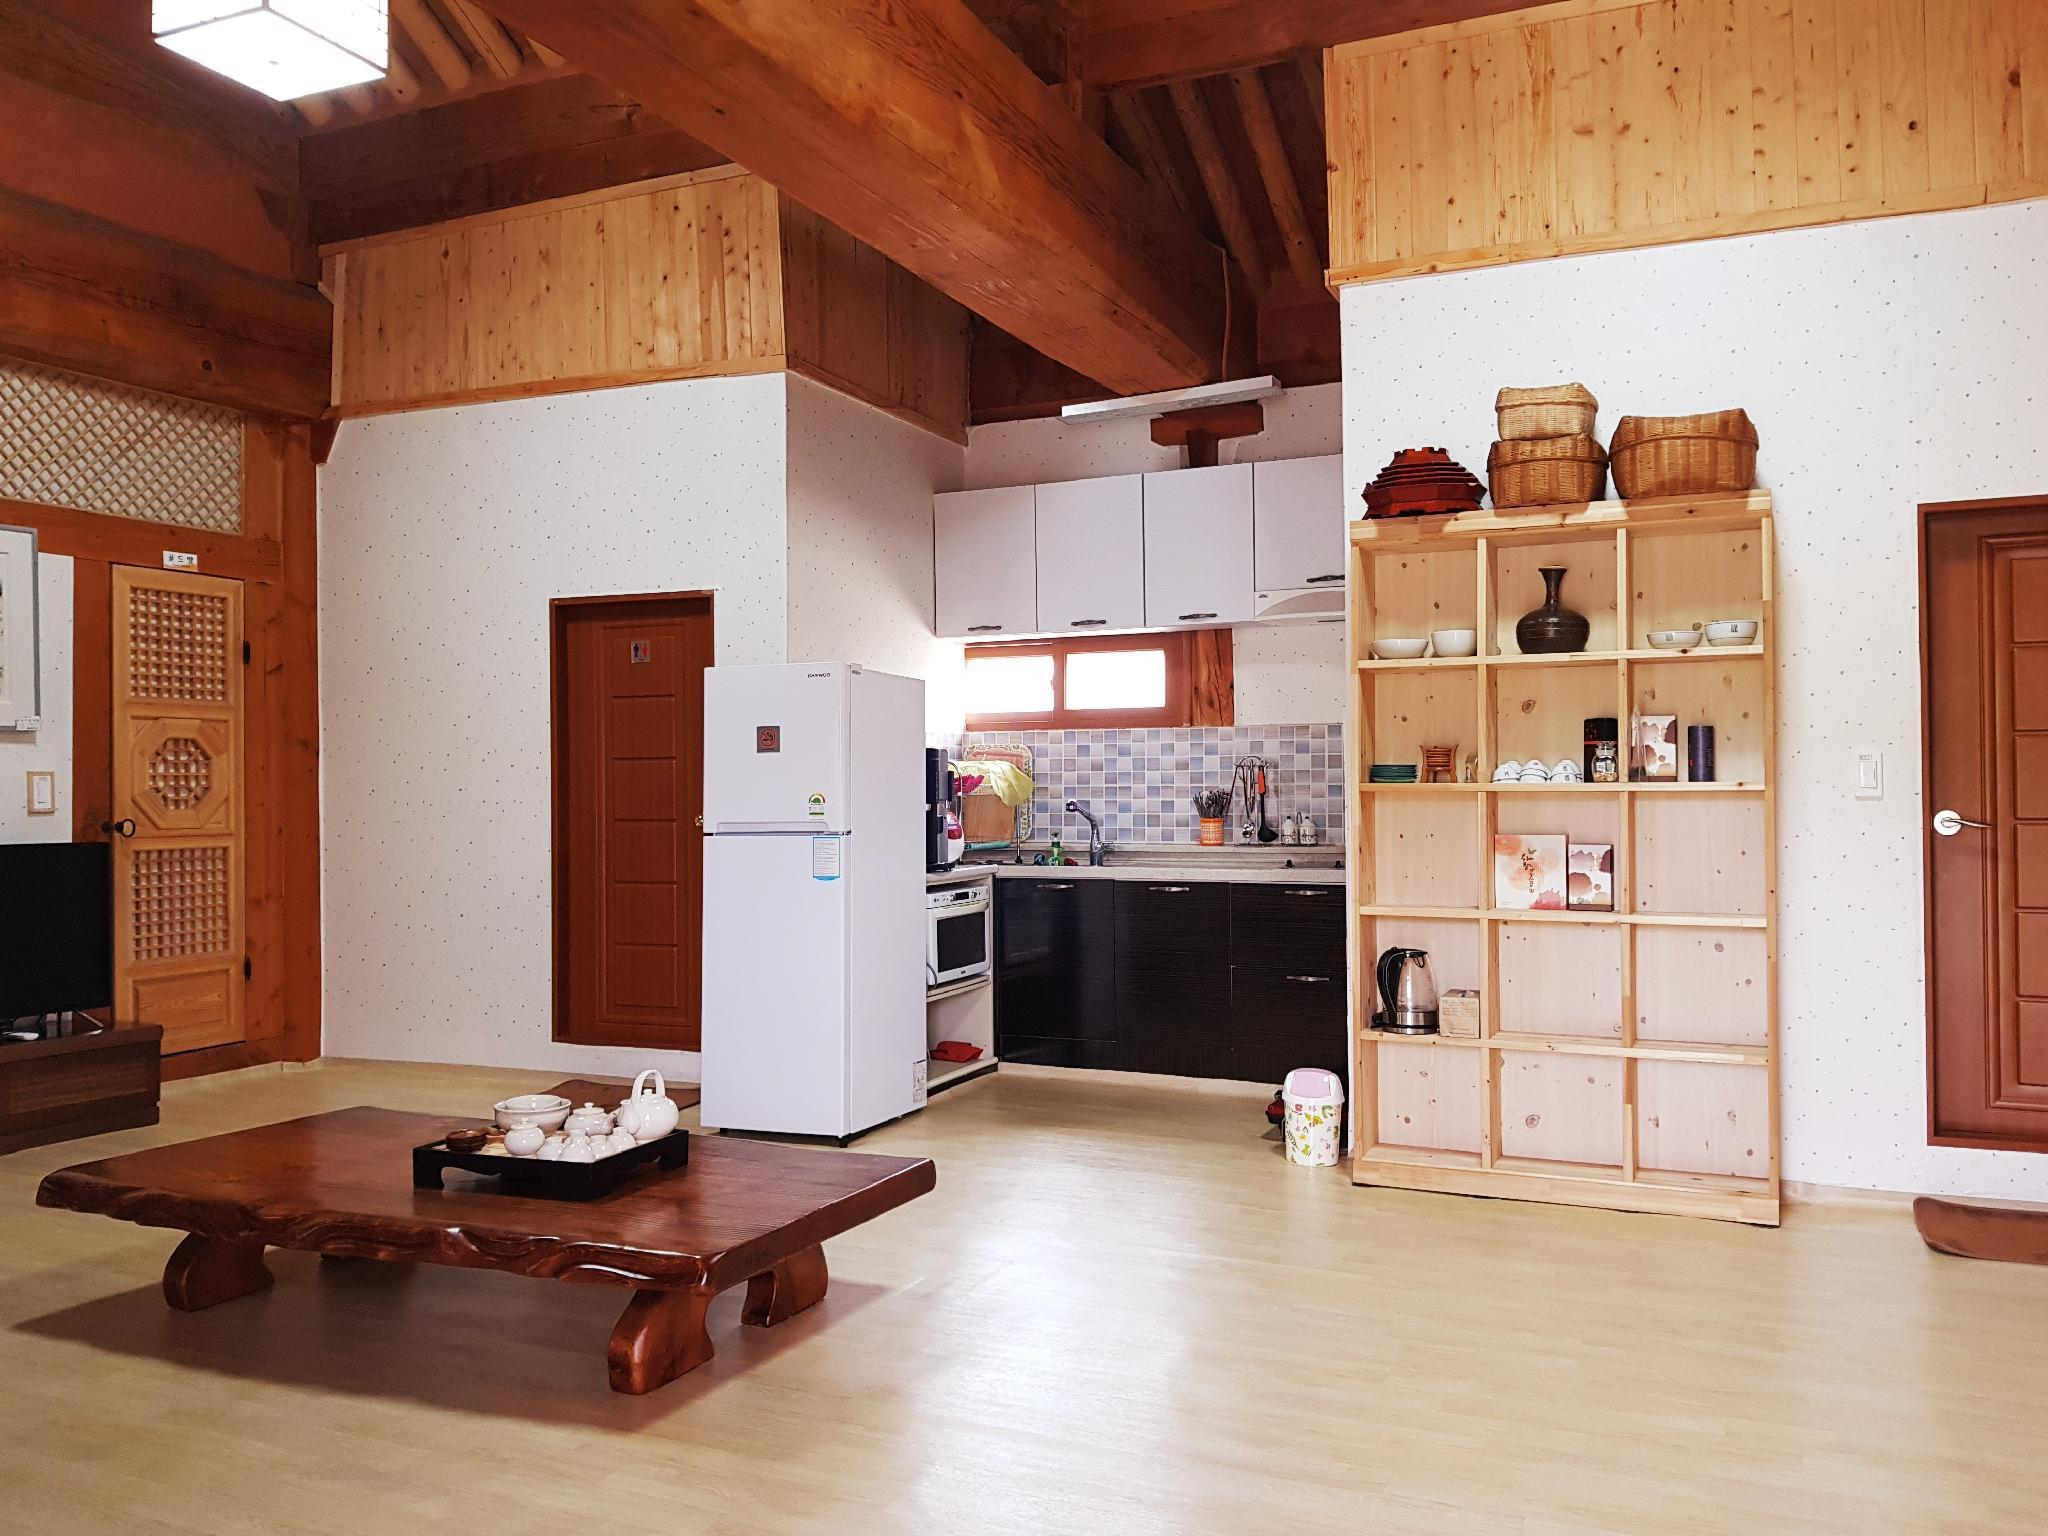 Sujin Hanok Pension unshared house